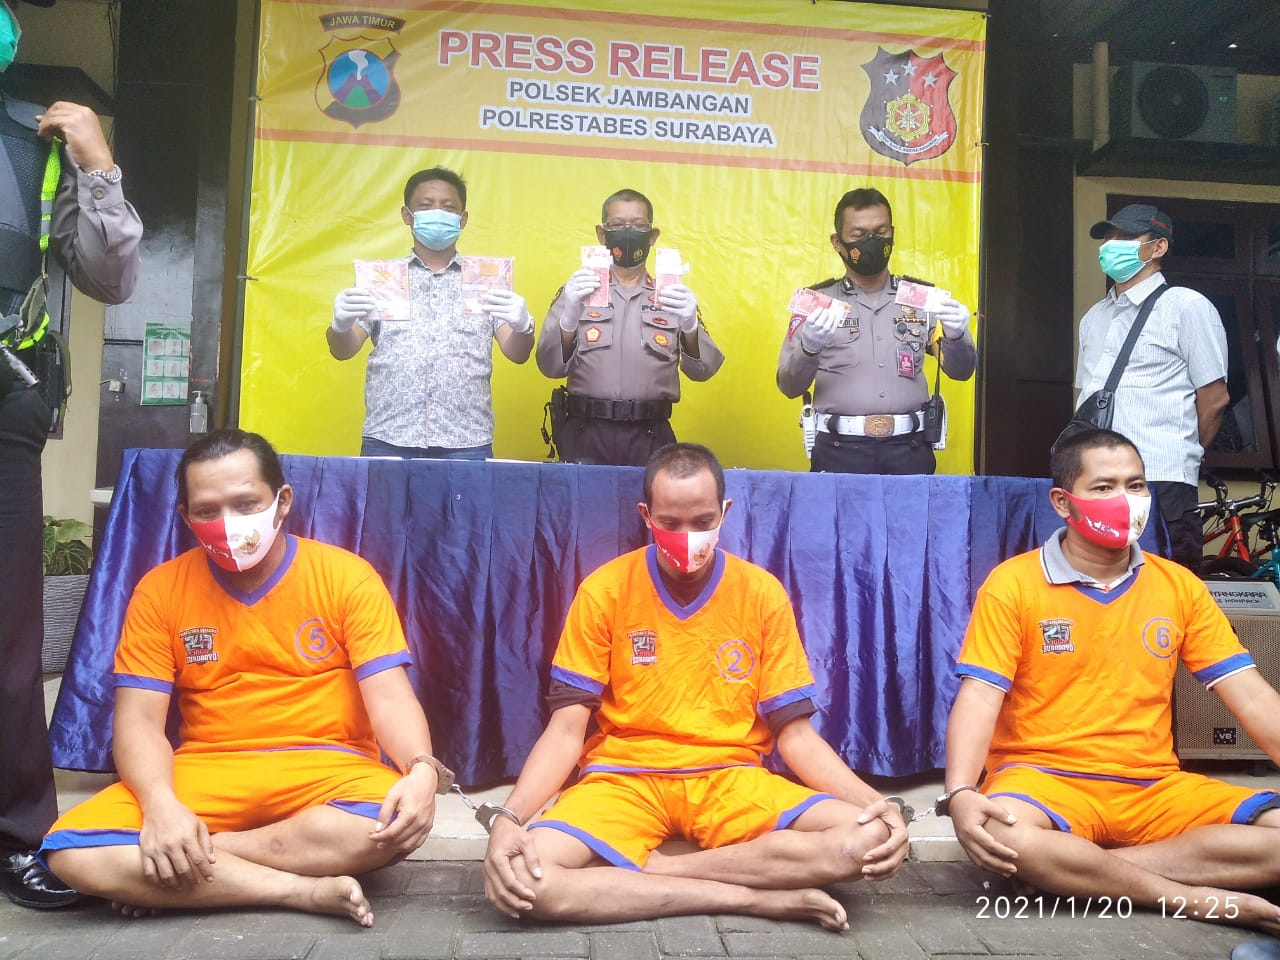 Unit Reskrim Polsek Jambangan Gagalkan Peredaran Uang Palsu 245,9 Juta